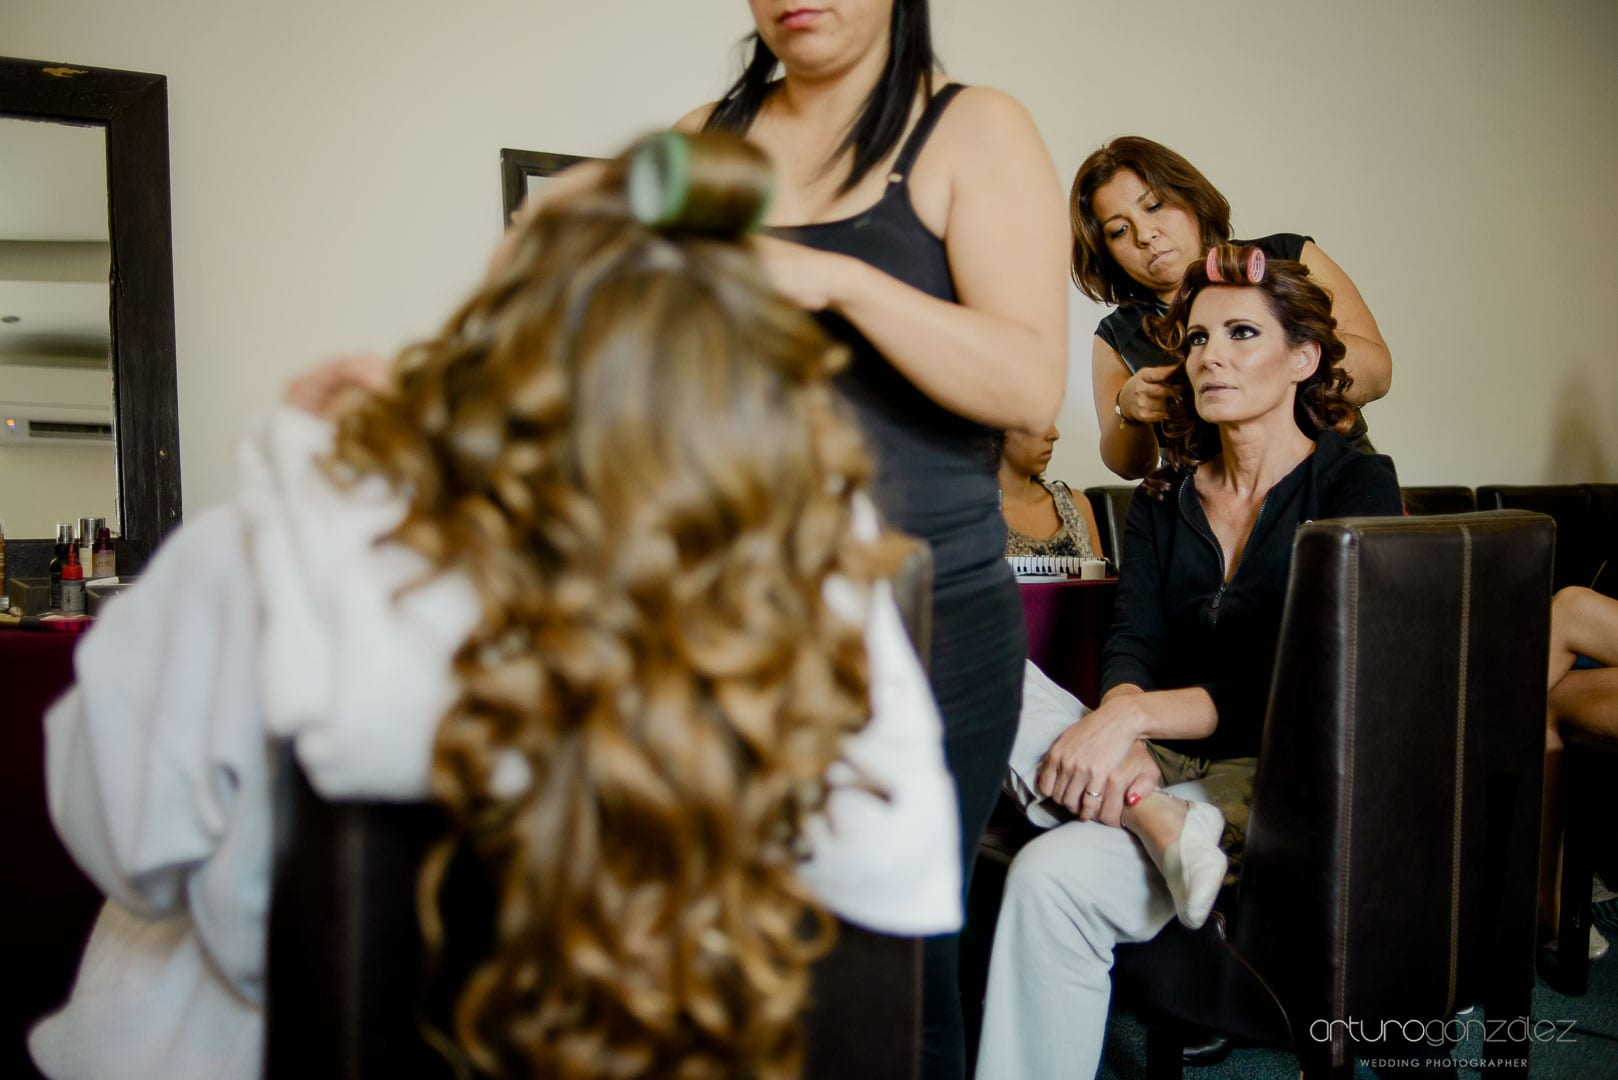 fotografo-de-bodas-en-guanajuato-1